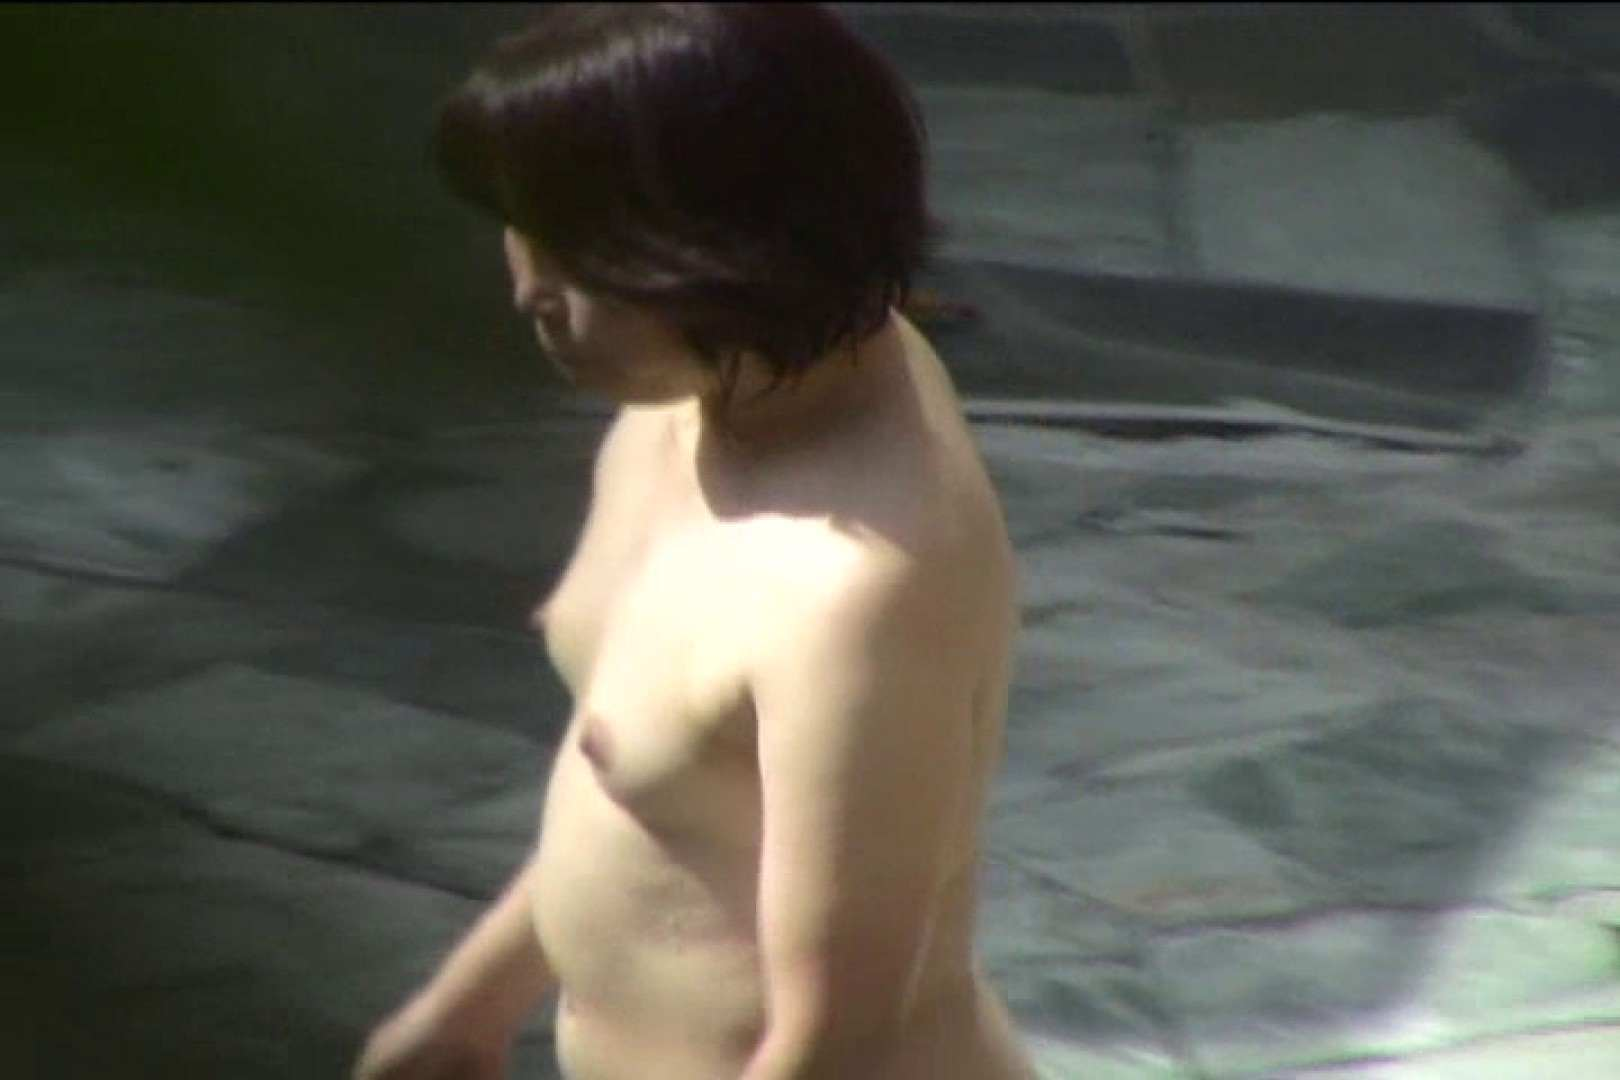 Aquaな露天風呂Vol.451 露天風呂編  104PIX 74